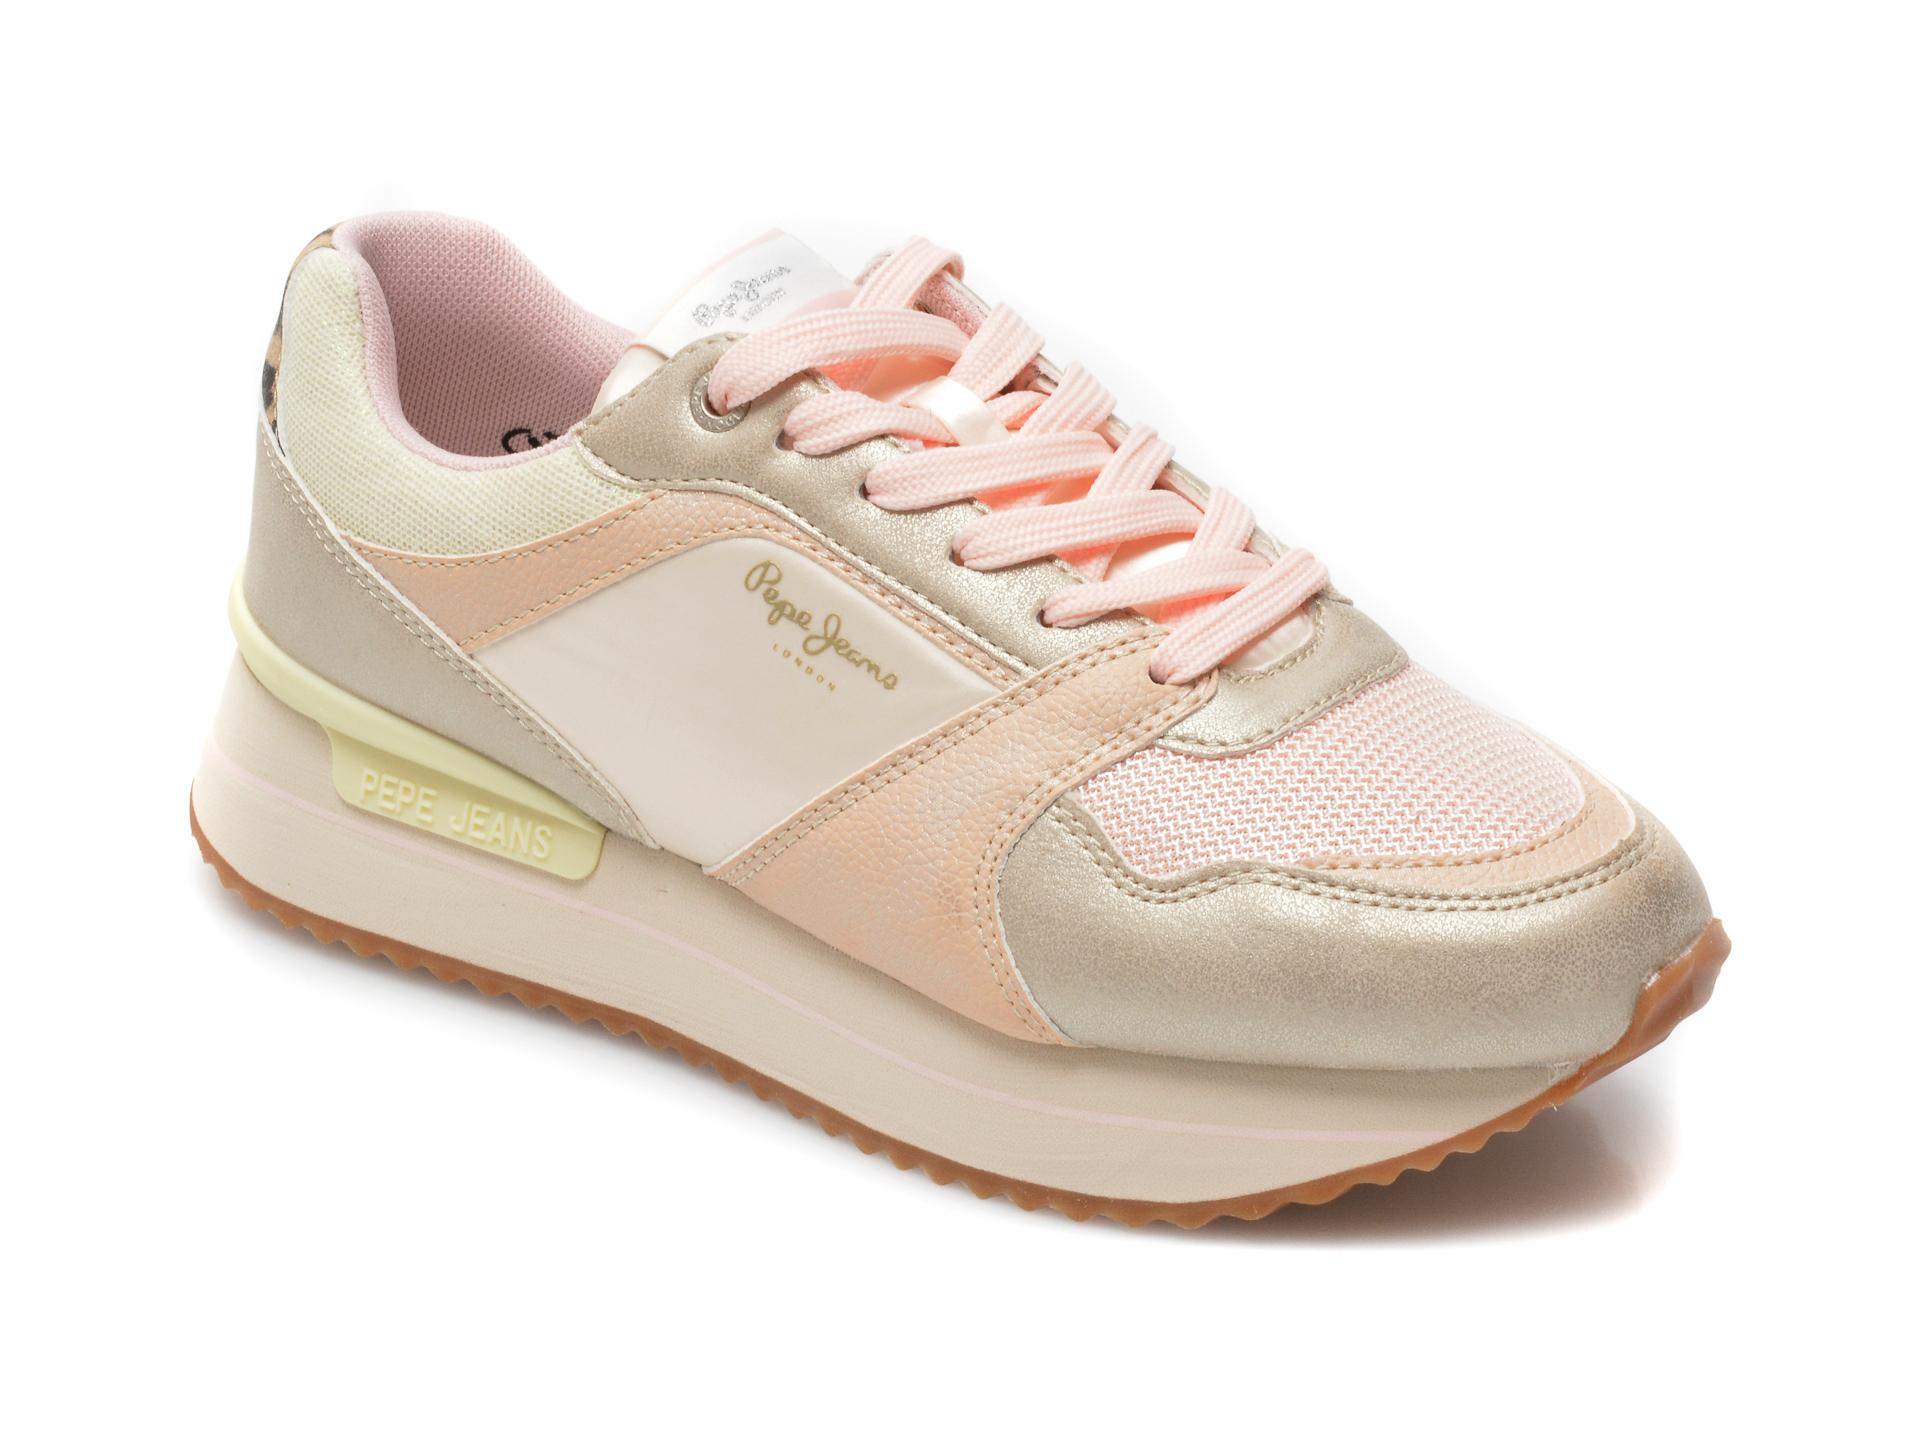 Pantofi sport PEPE JEANS roz, 3118999, din material textil si piele naturala imagine otter.ro